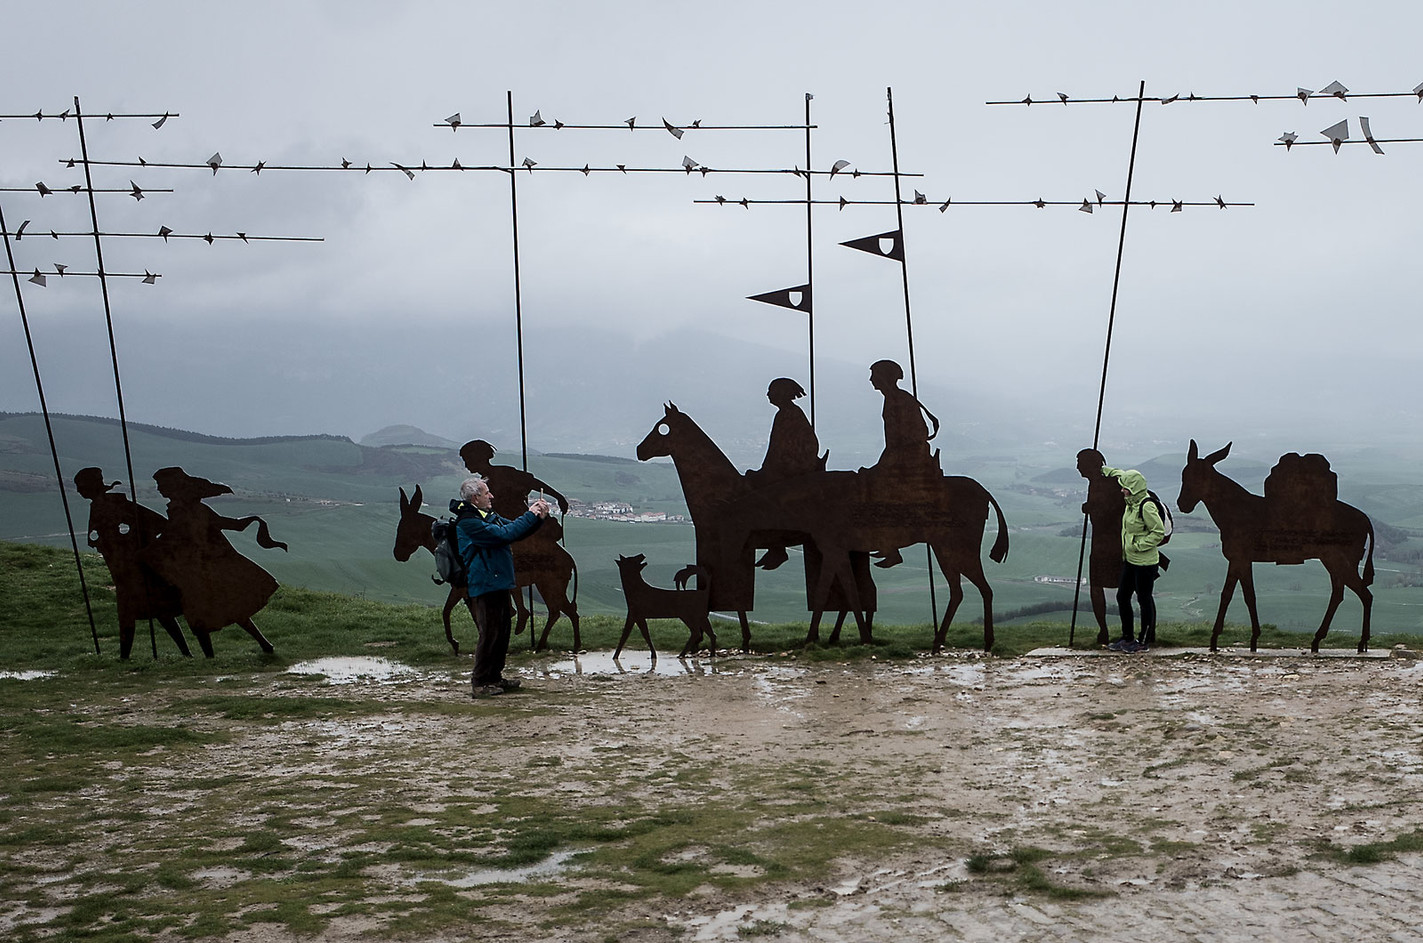 Pilgrims take a photo next to the sculpture atop the minor ridge of Alto de Perdón, a few kilometers outside of Pamplona.